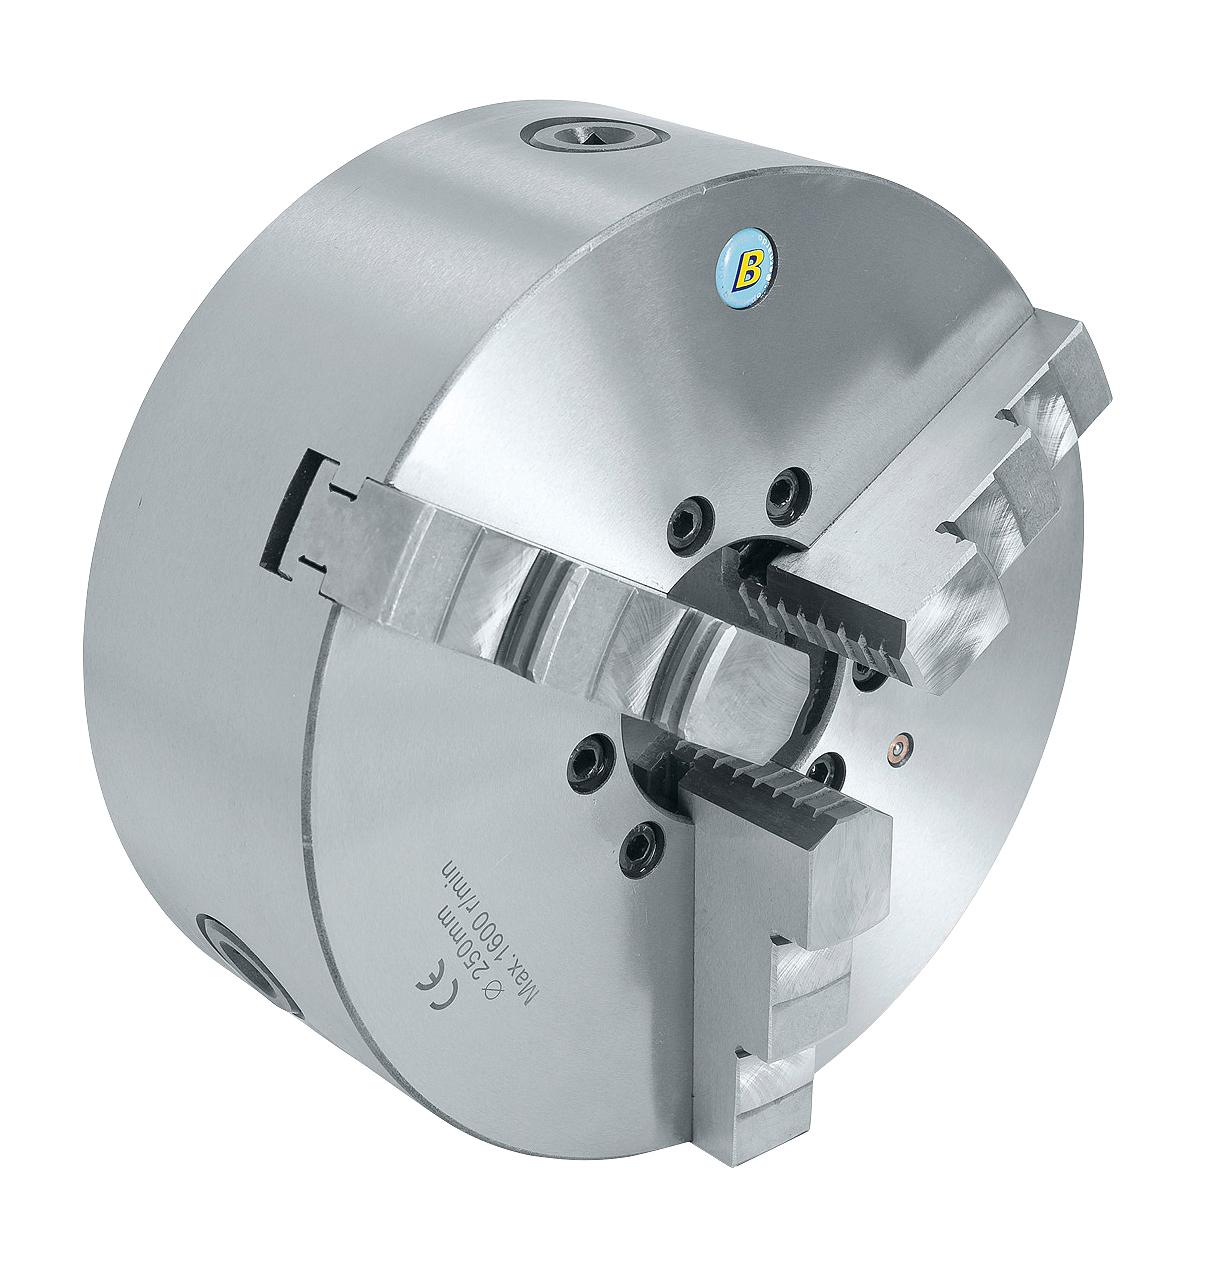 3 bakket centrerpatron standard DK11-100